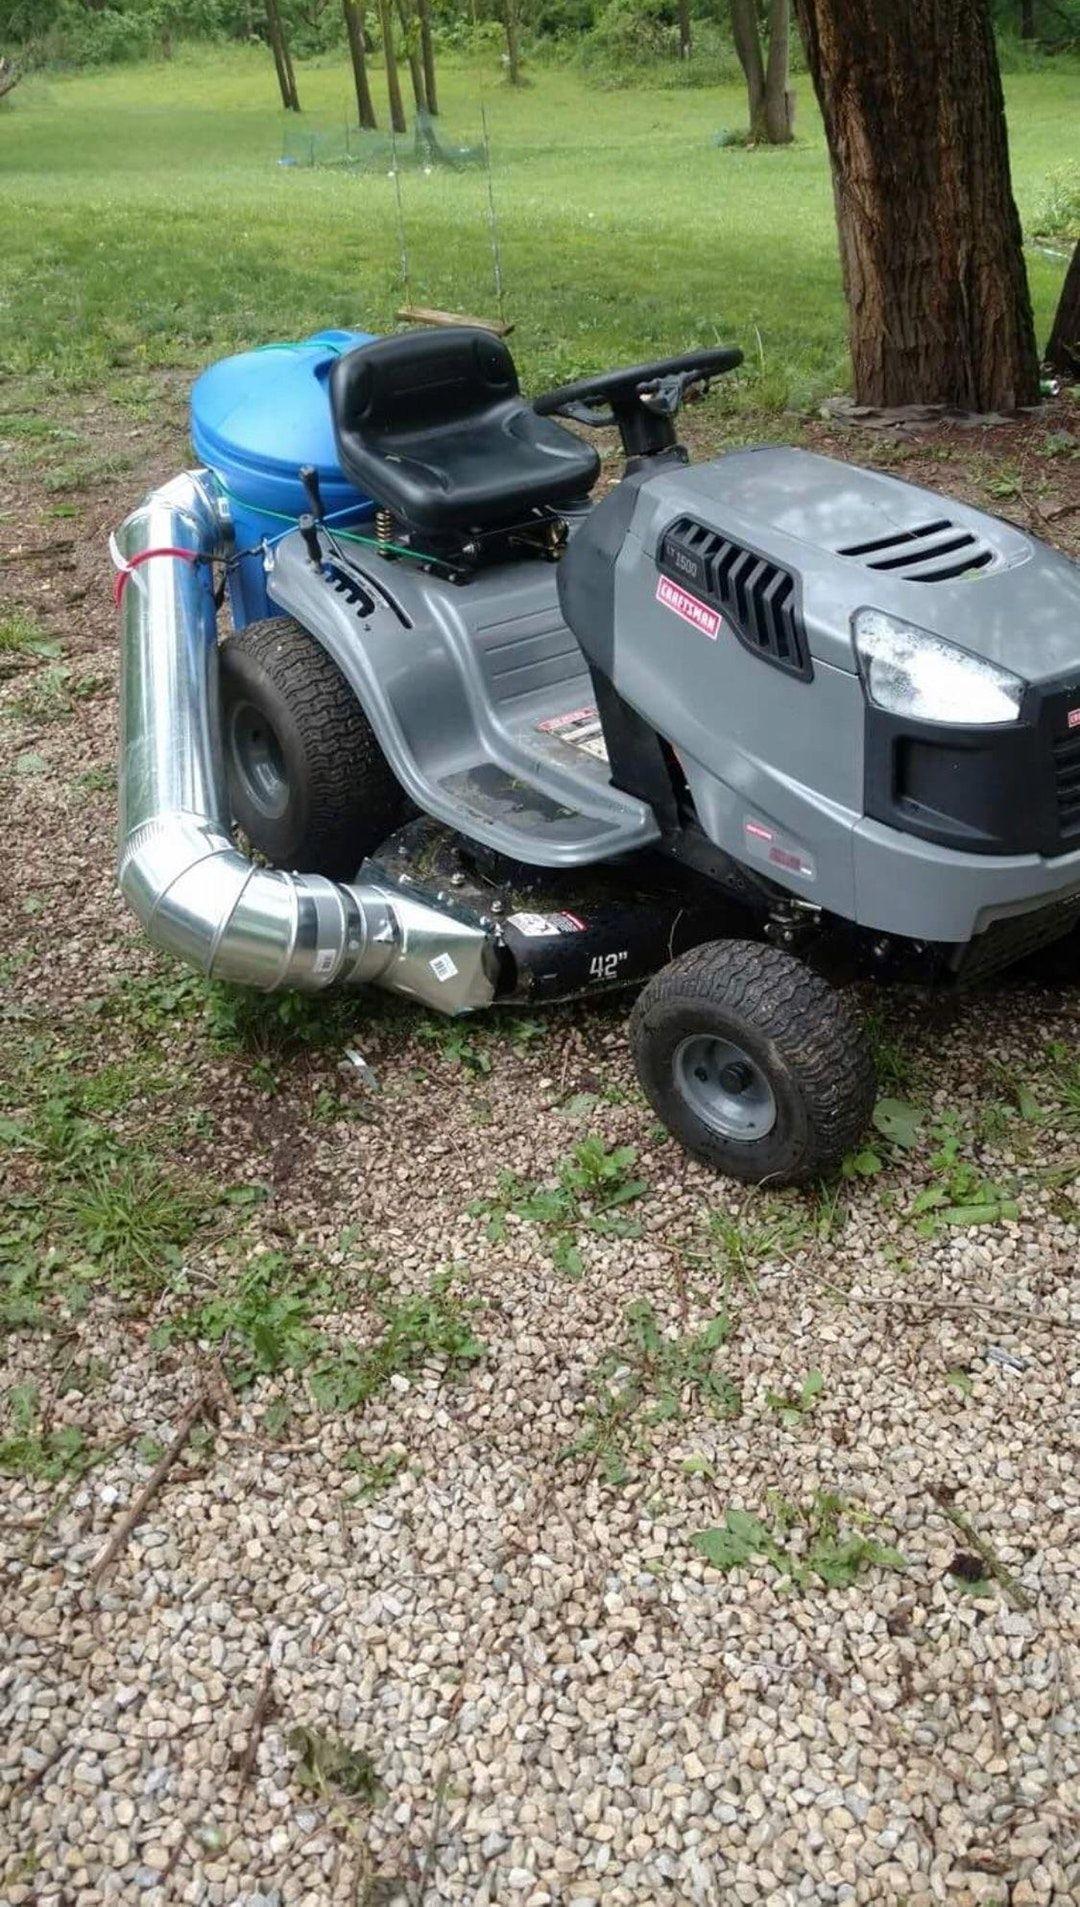 300 For A Bagger I Don T Think So Lifehacks Lawn Mower Riding Lawn Mowers Diy Lawn